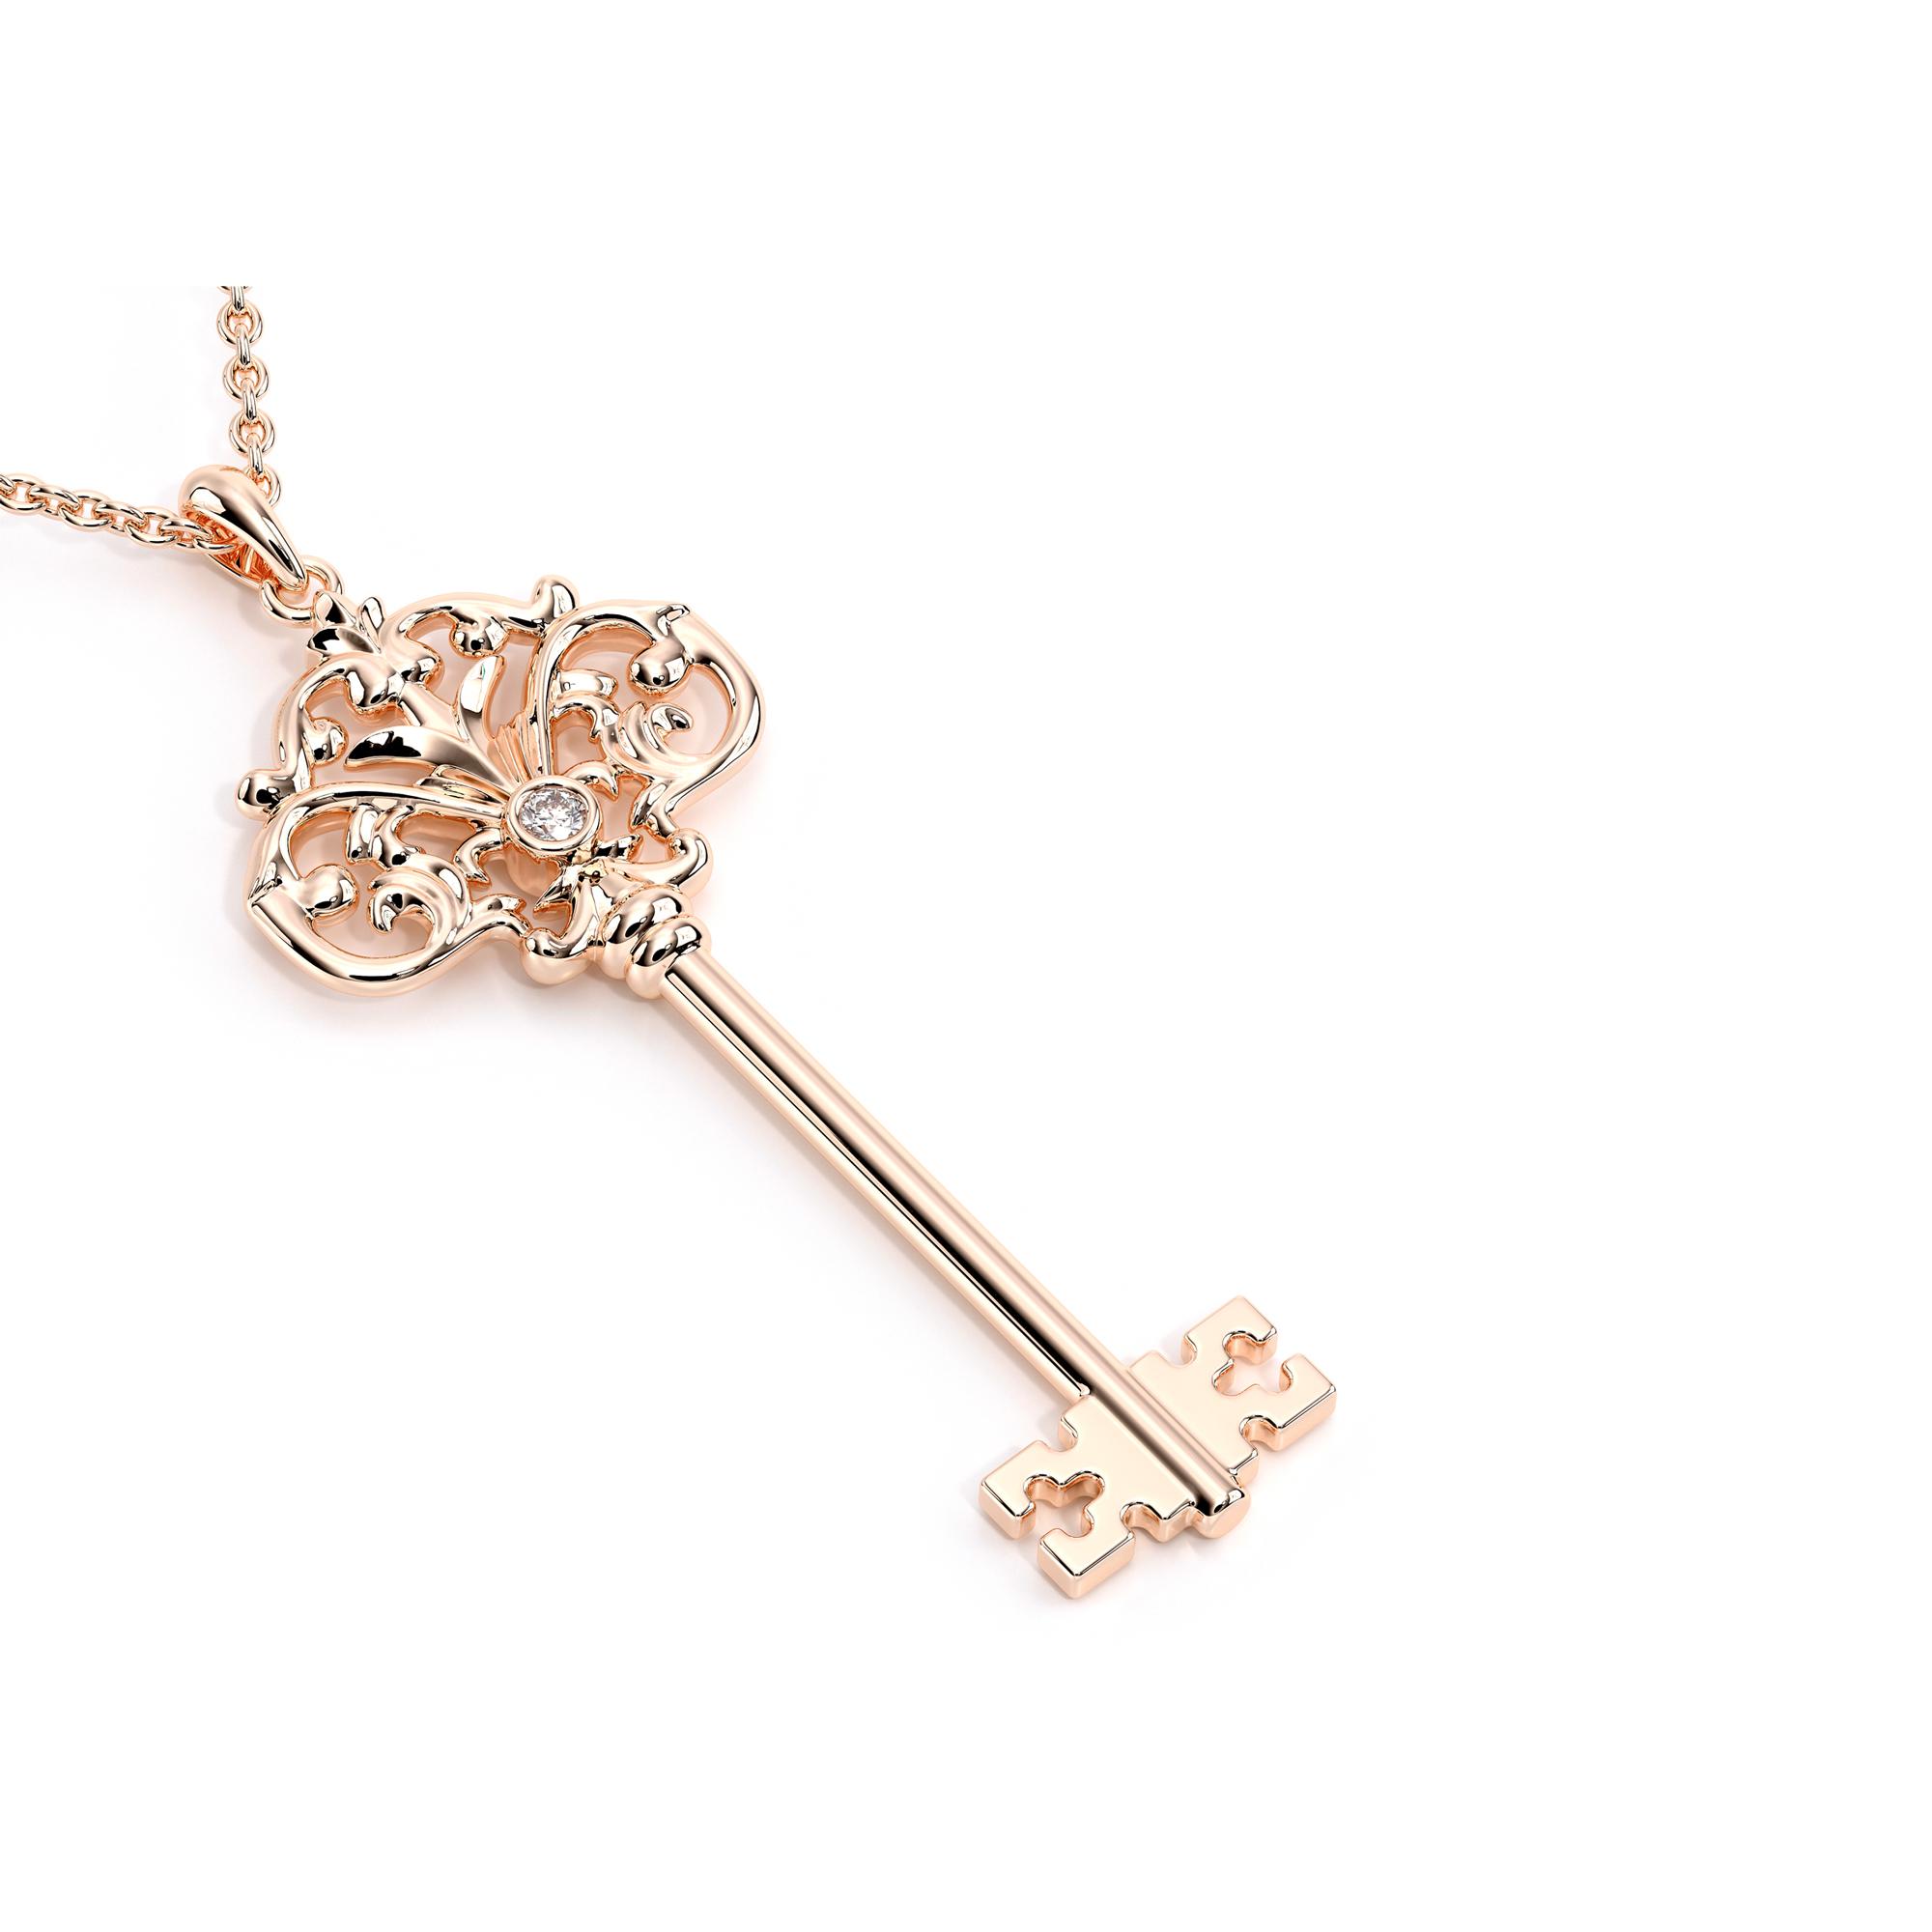 Rose Gold Pendant Diamond Key Necklace Unique Gift For Women